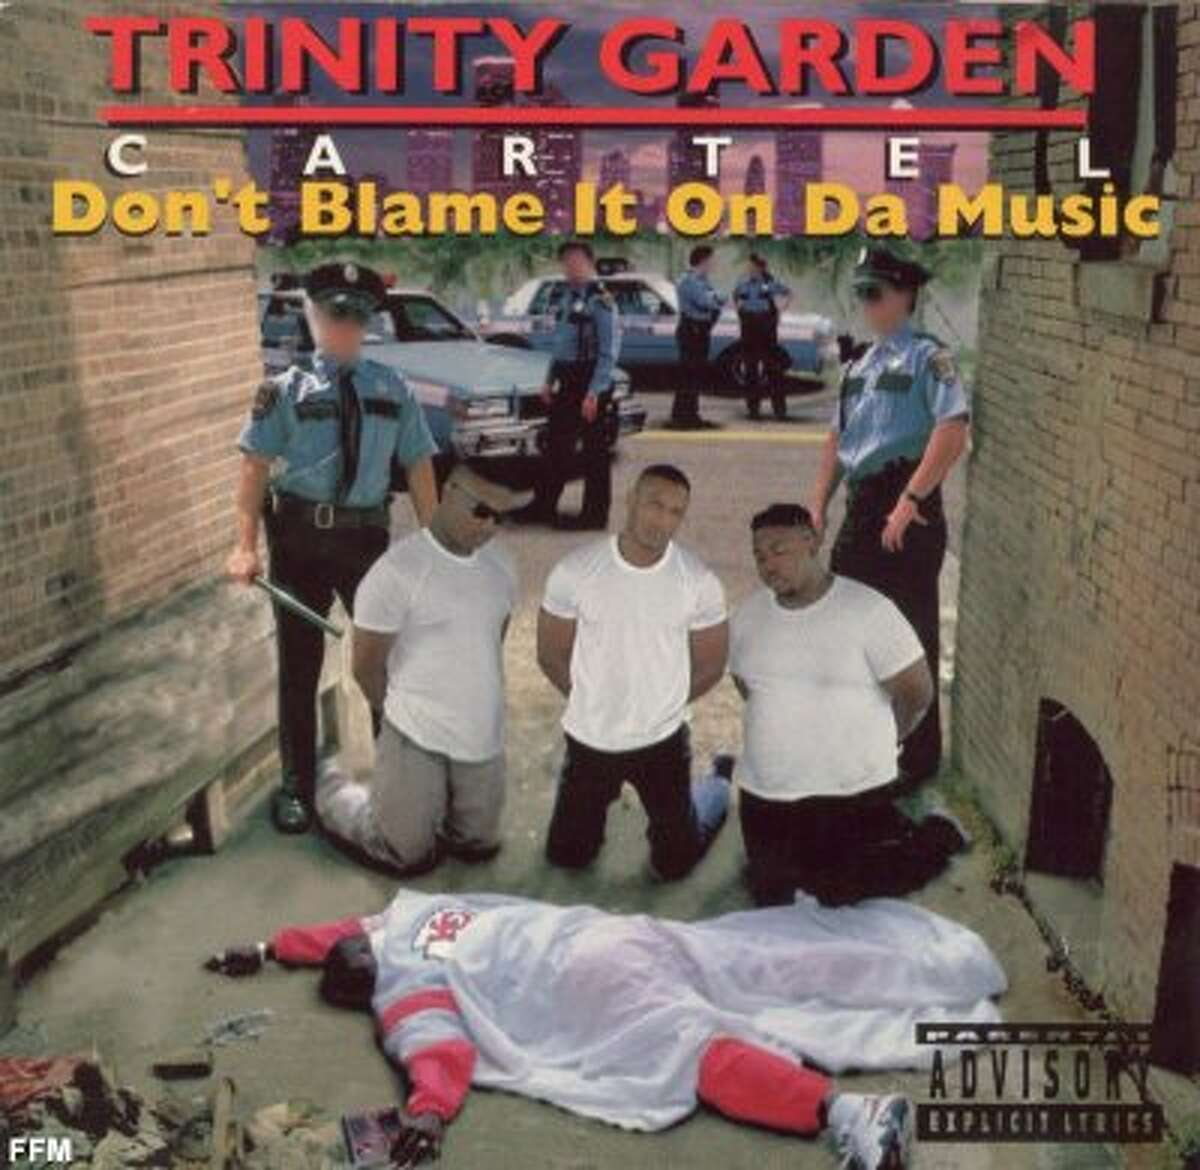 Trinity Garden Cartel -